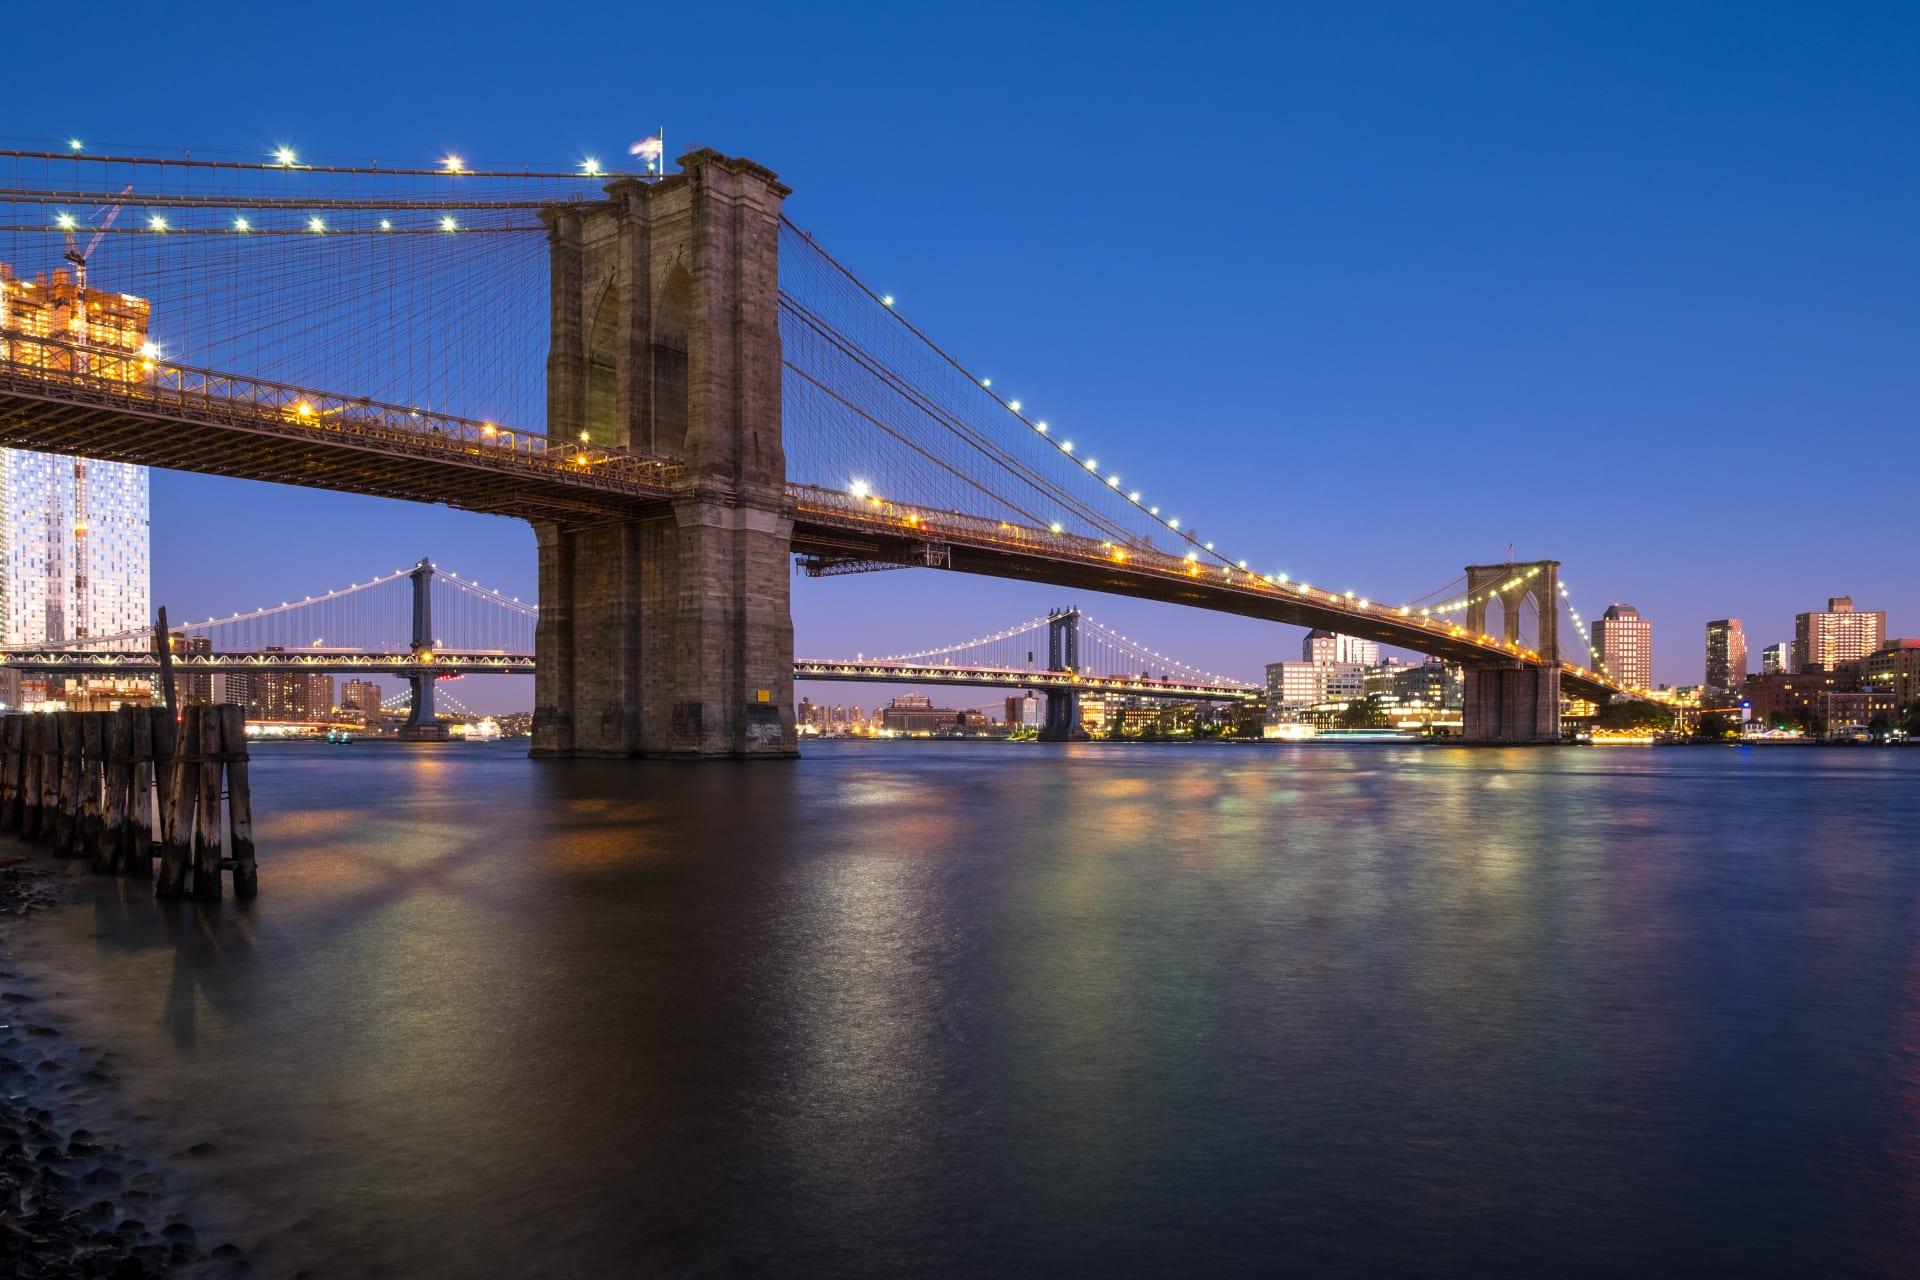 New York - New York at Night: South Street Seaport